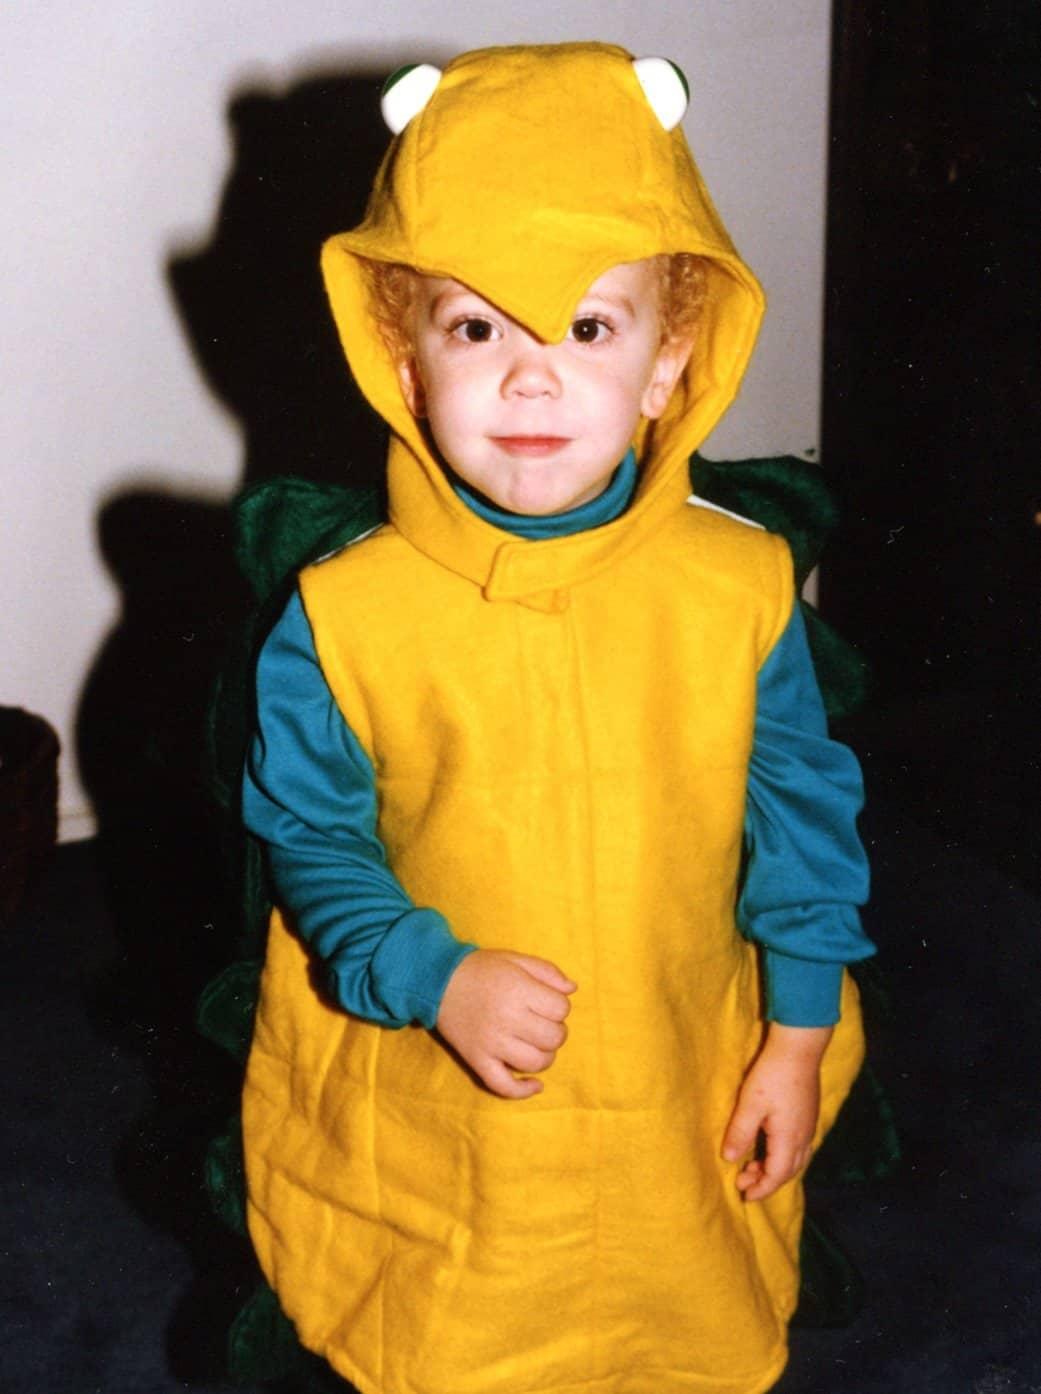 Halloween costumes Spooky Halloween Costumes  sc 1 st  Good Parenting Brighter Children & Spooky Halloween Costumes Your Kids Will Love u2014 Good Parenting ...